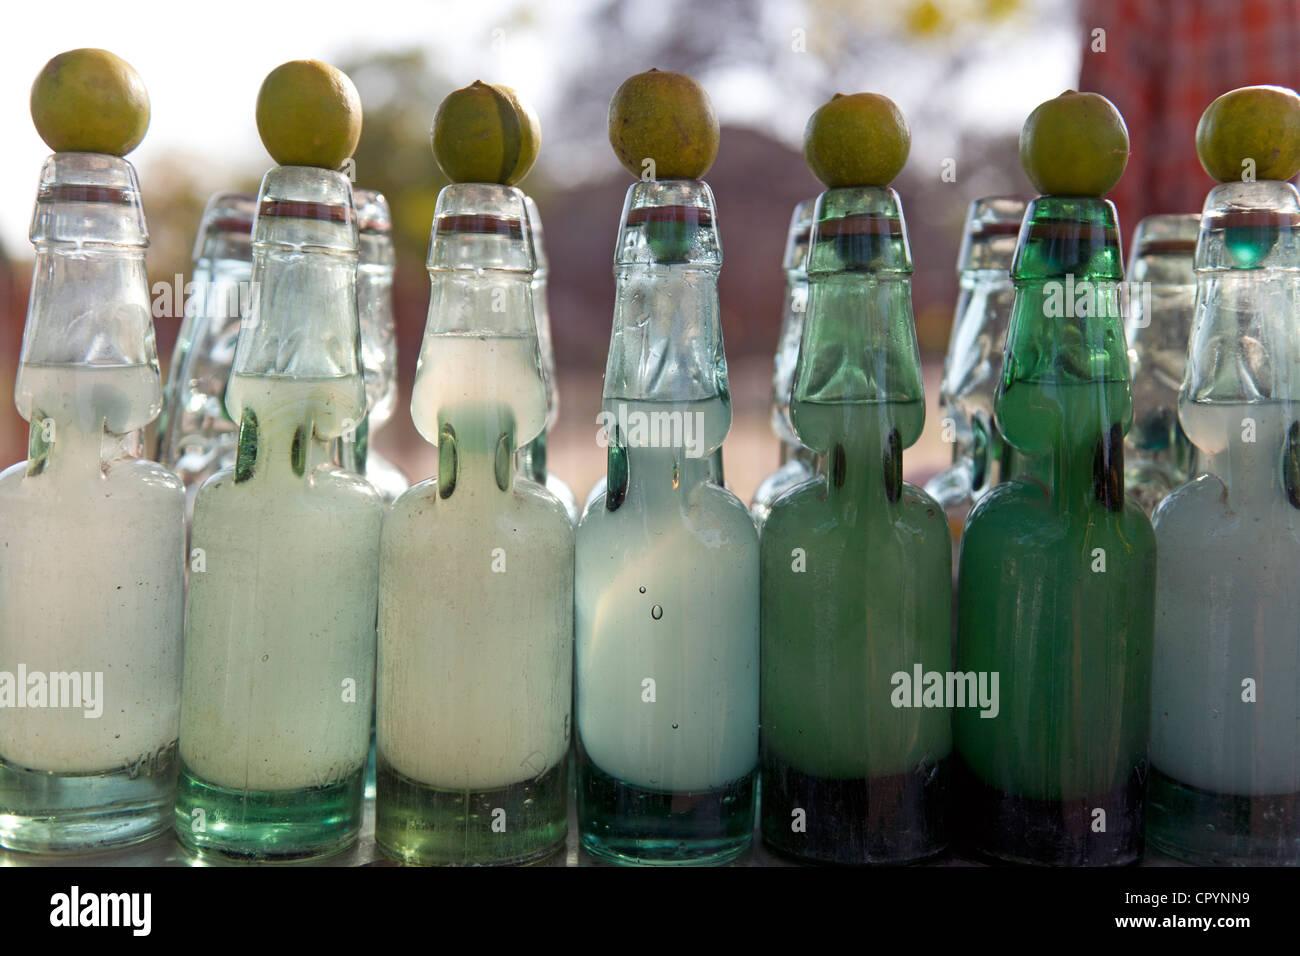 Limbu-Pani lemon drink at a stall, New Delhi, India, Asia - Stock Image